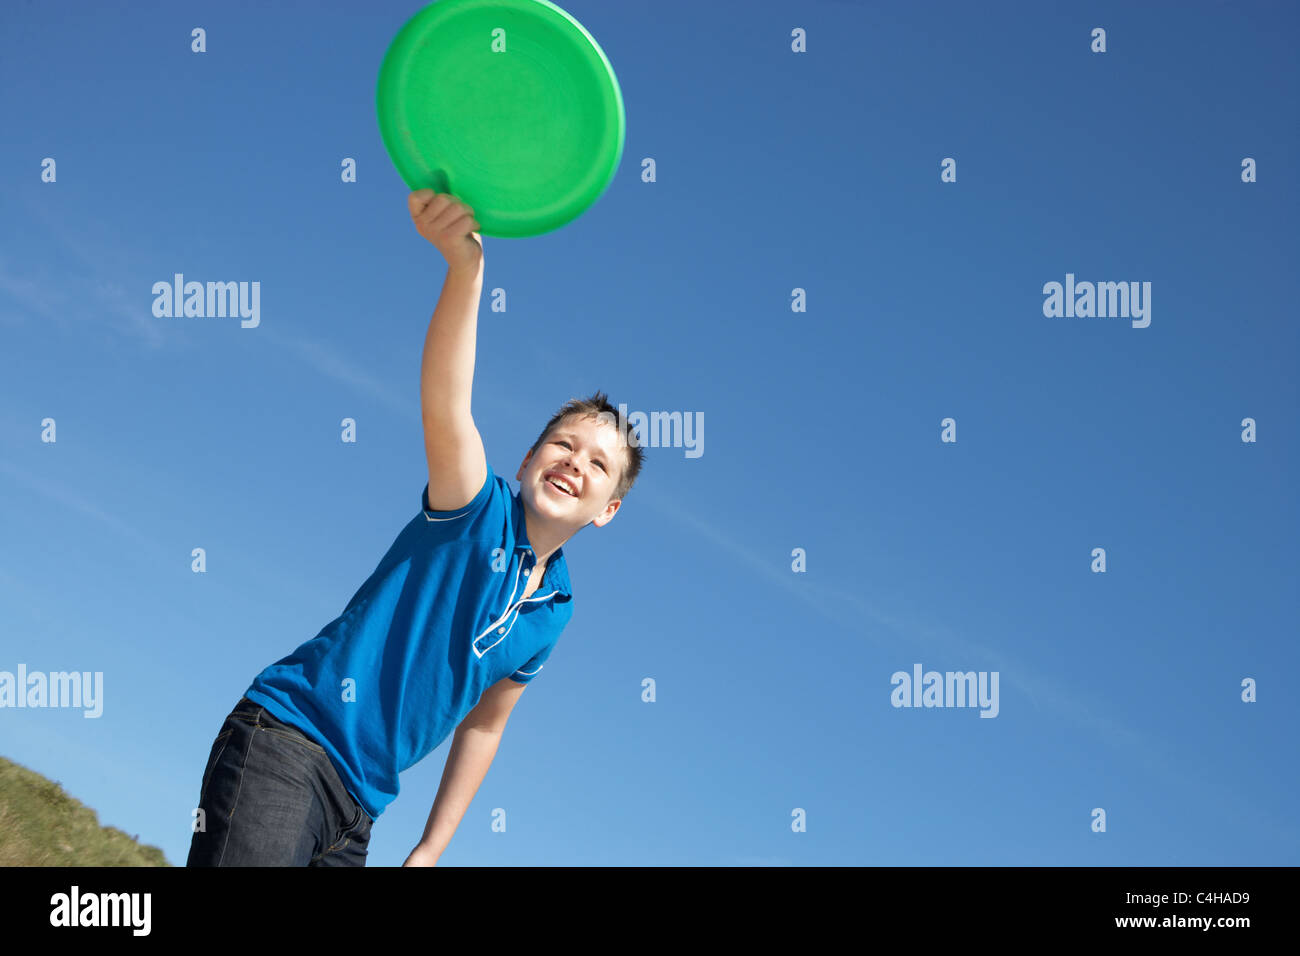 Boy playing frisbee on beach - Stock Image